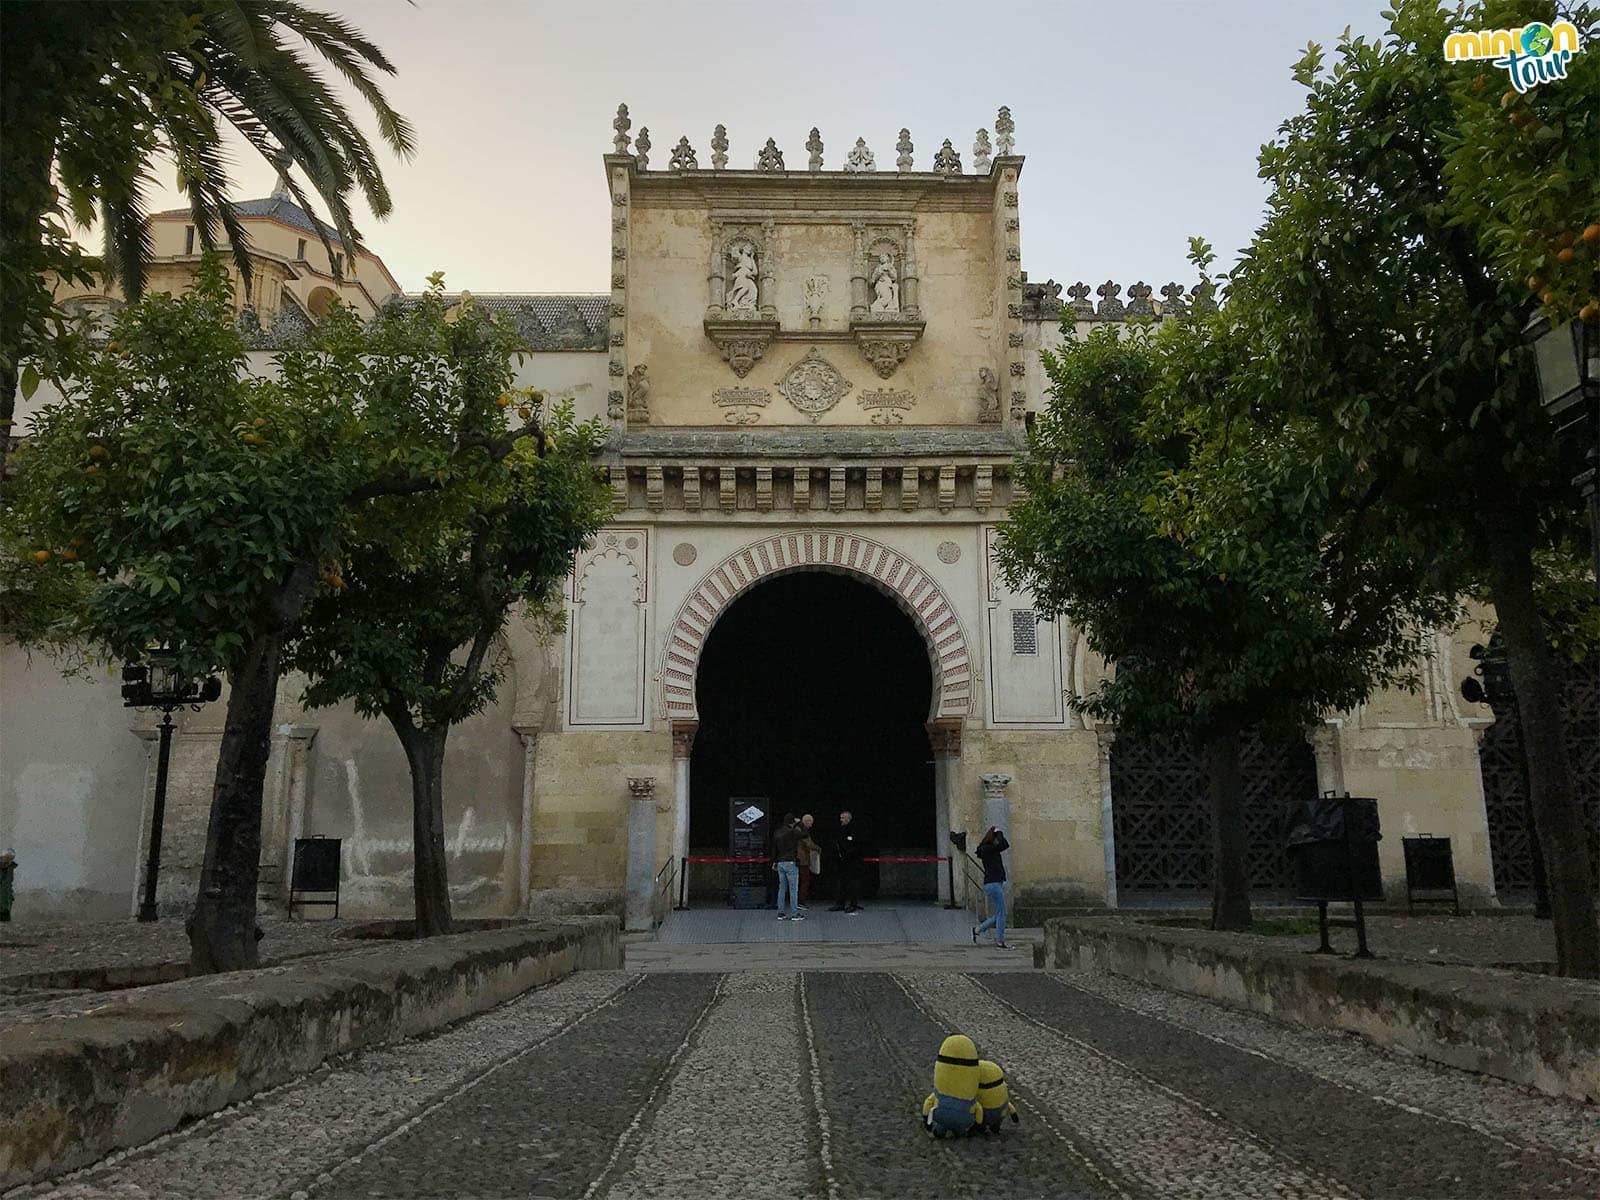 Vamos a visitar la Mezquita Catedral de Córdoba gratis